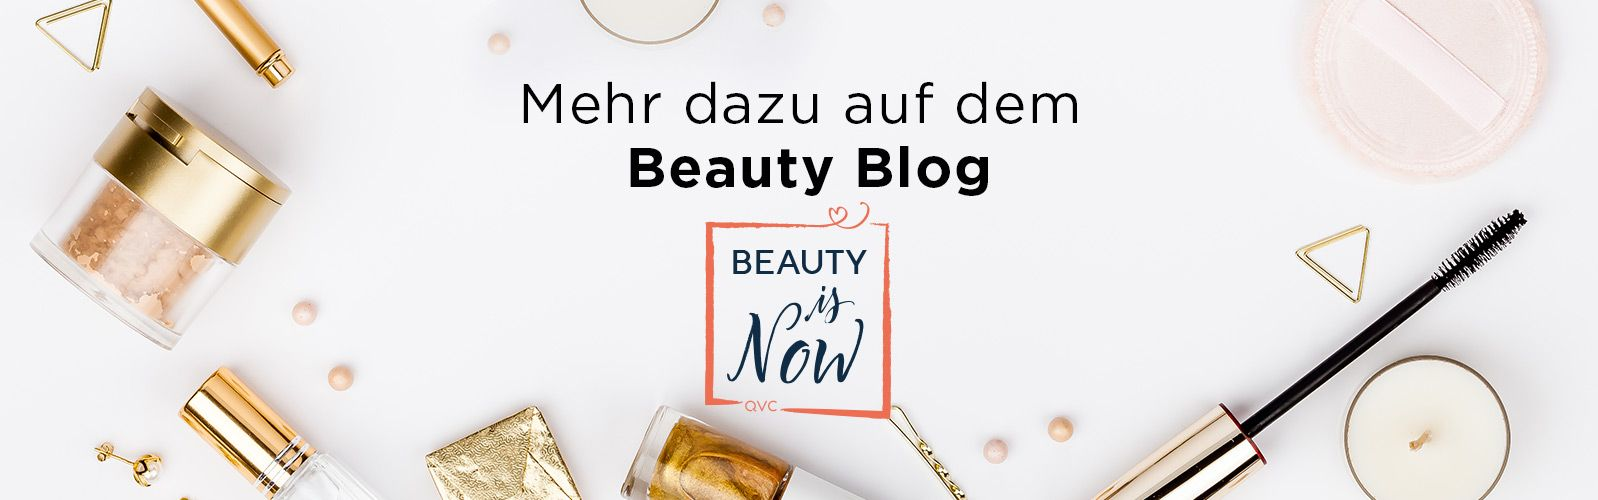 Beauty Blog Beitrag